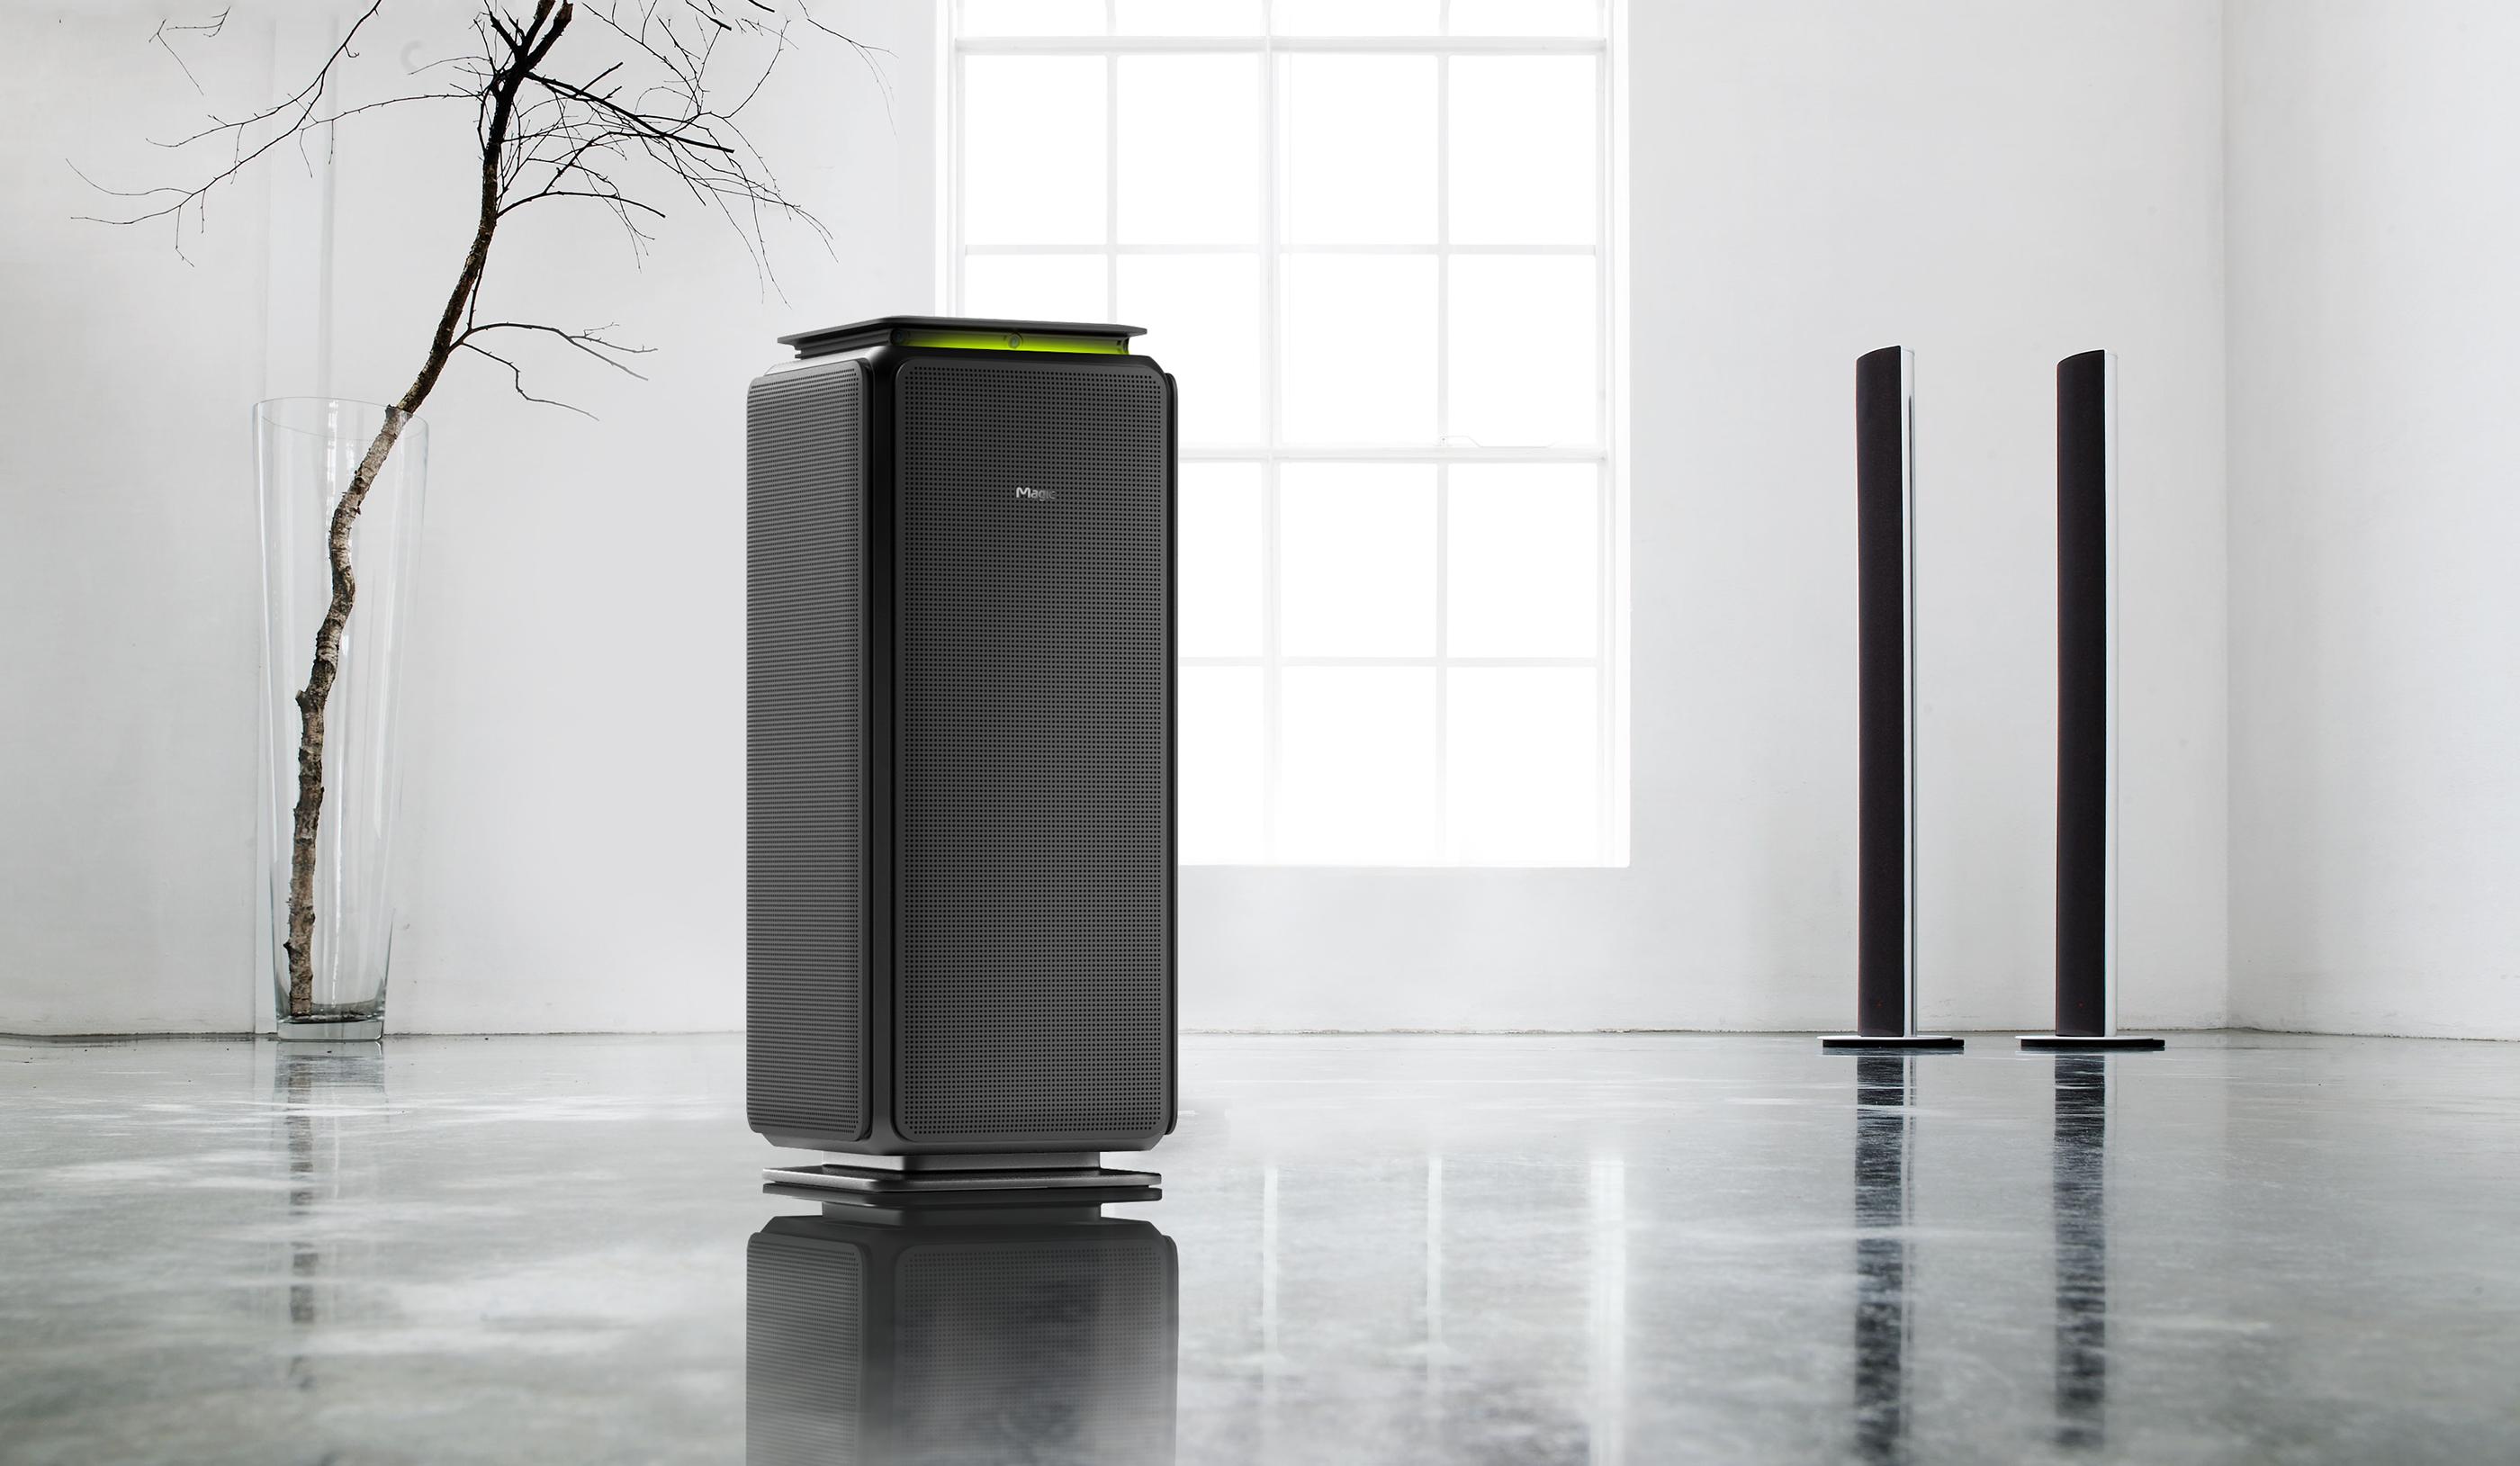 SK magic air purifier on Behance 제품 디자인, 세면대, 화장대